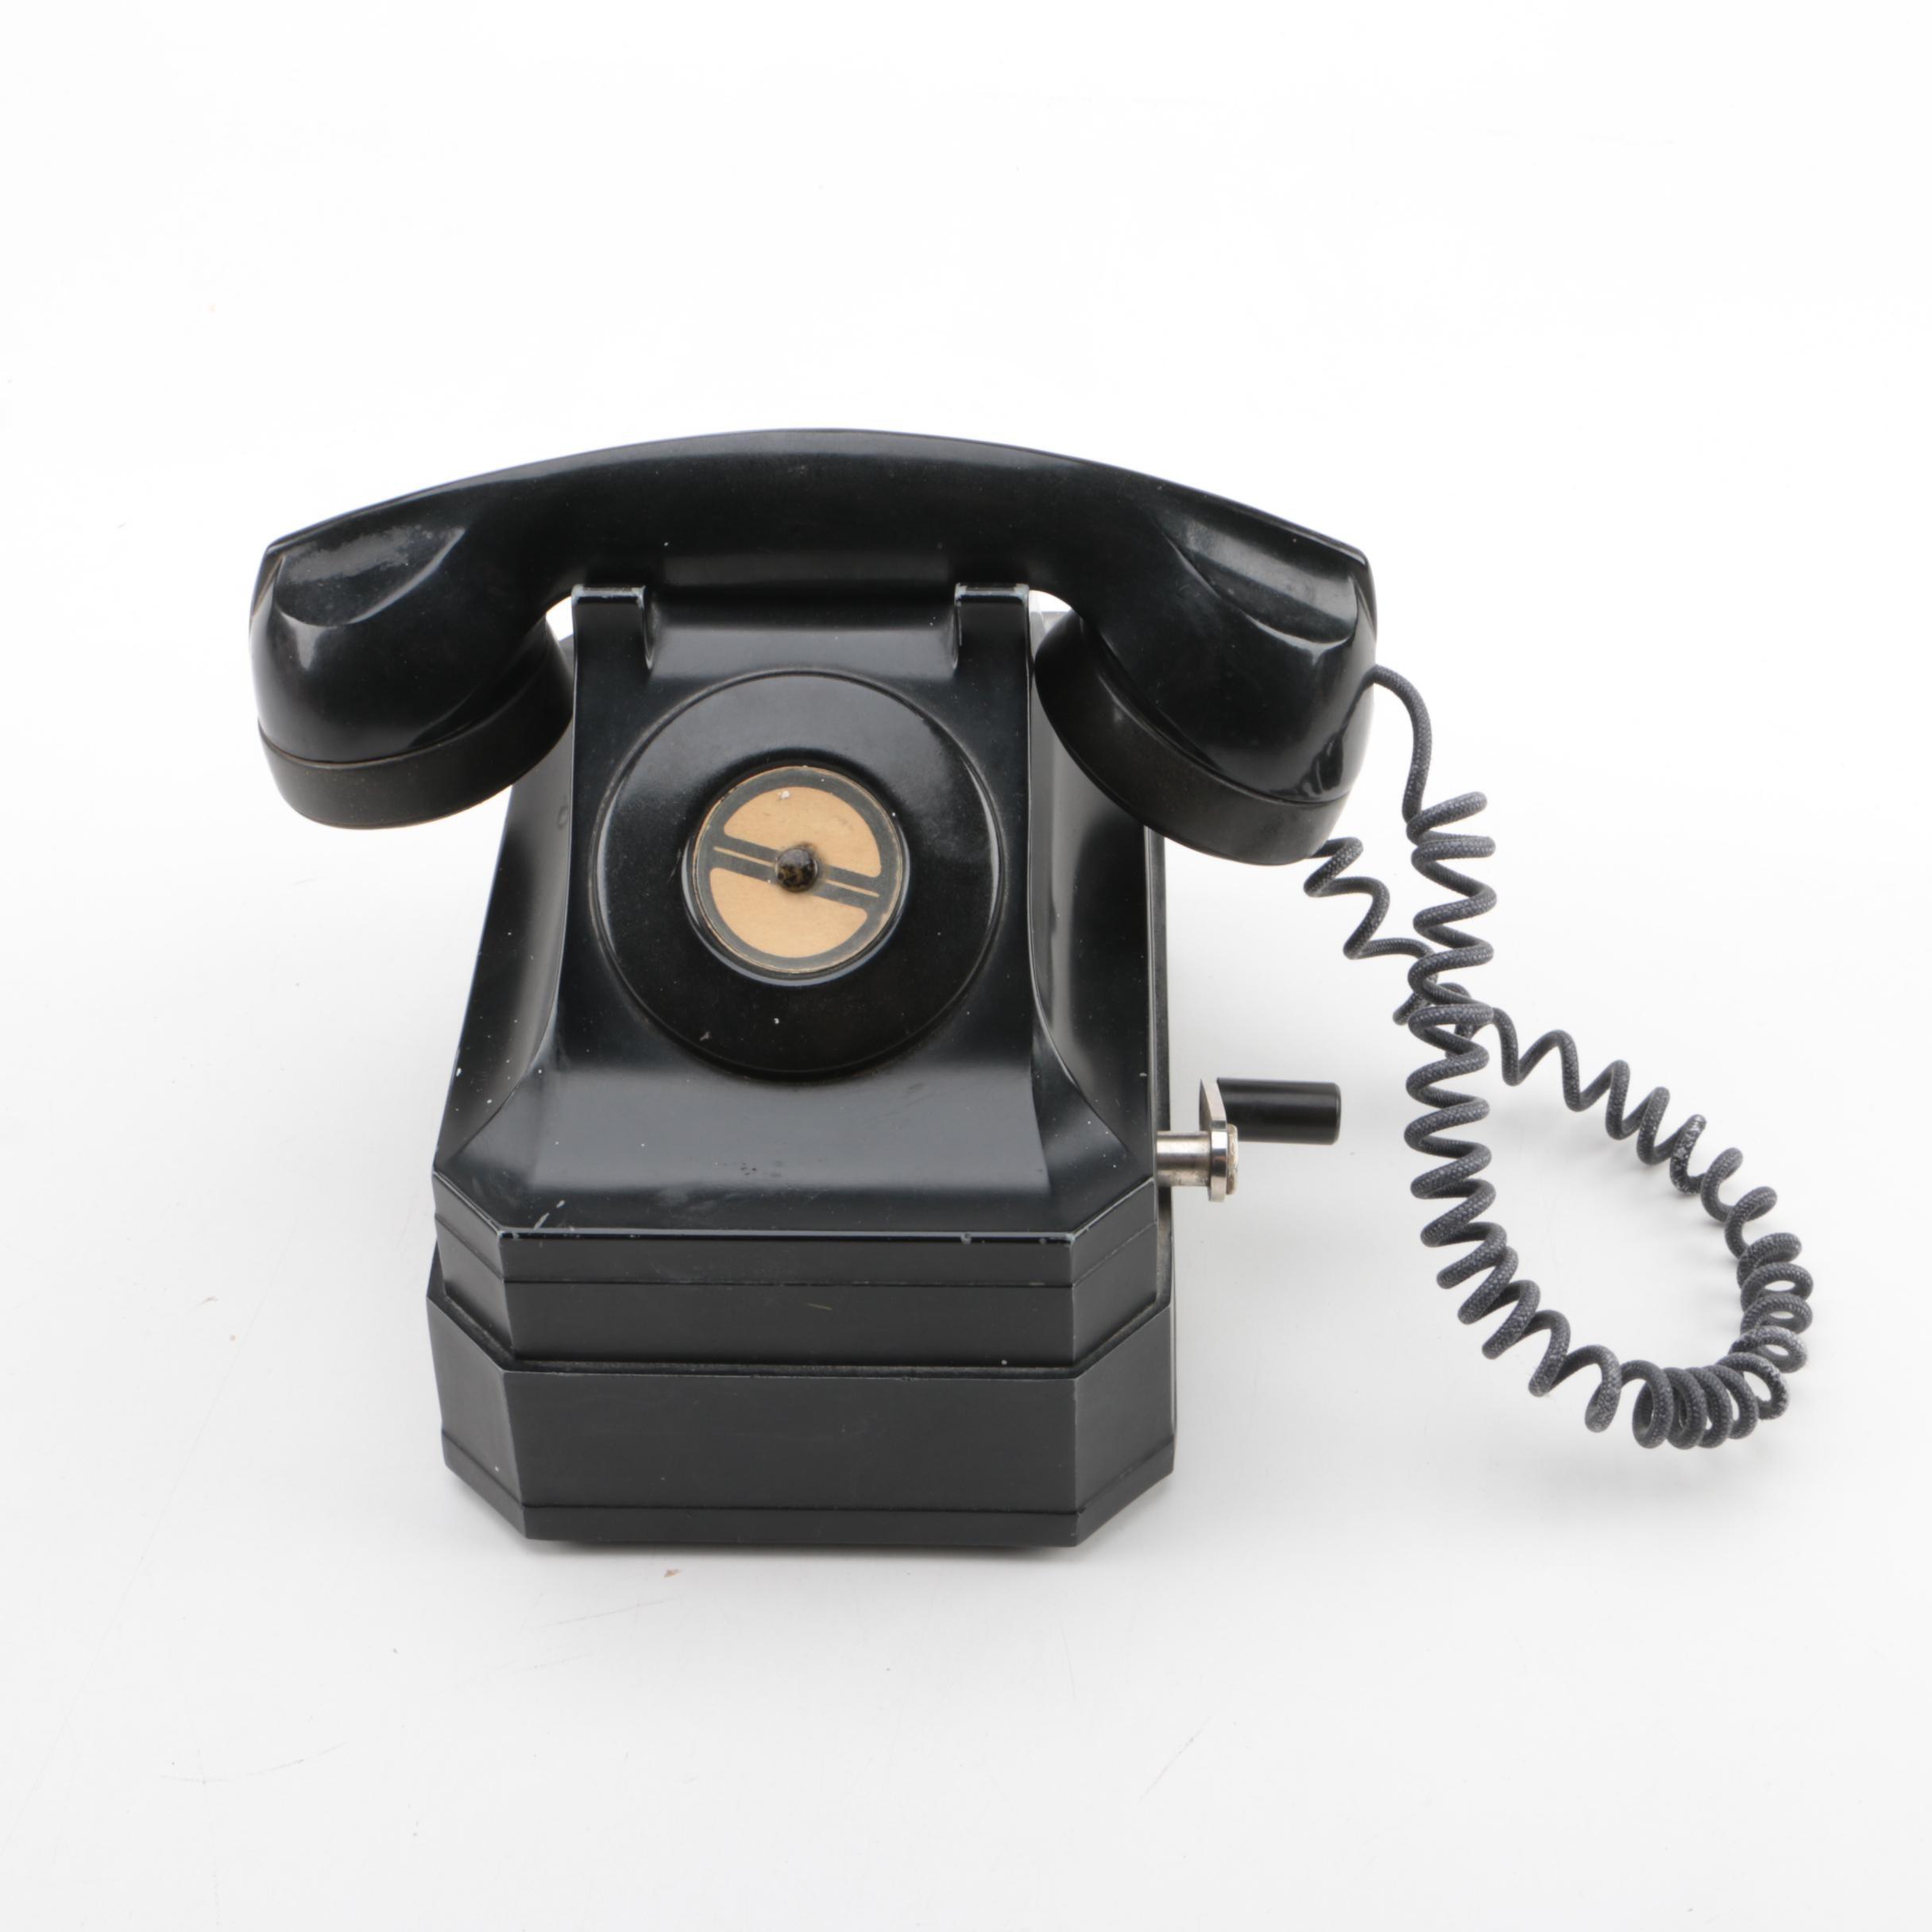 Vintage Stromberg Carlson Crank Telephone